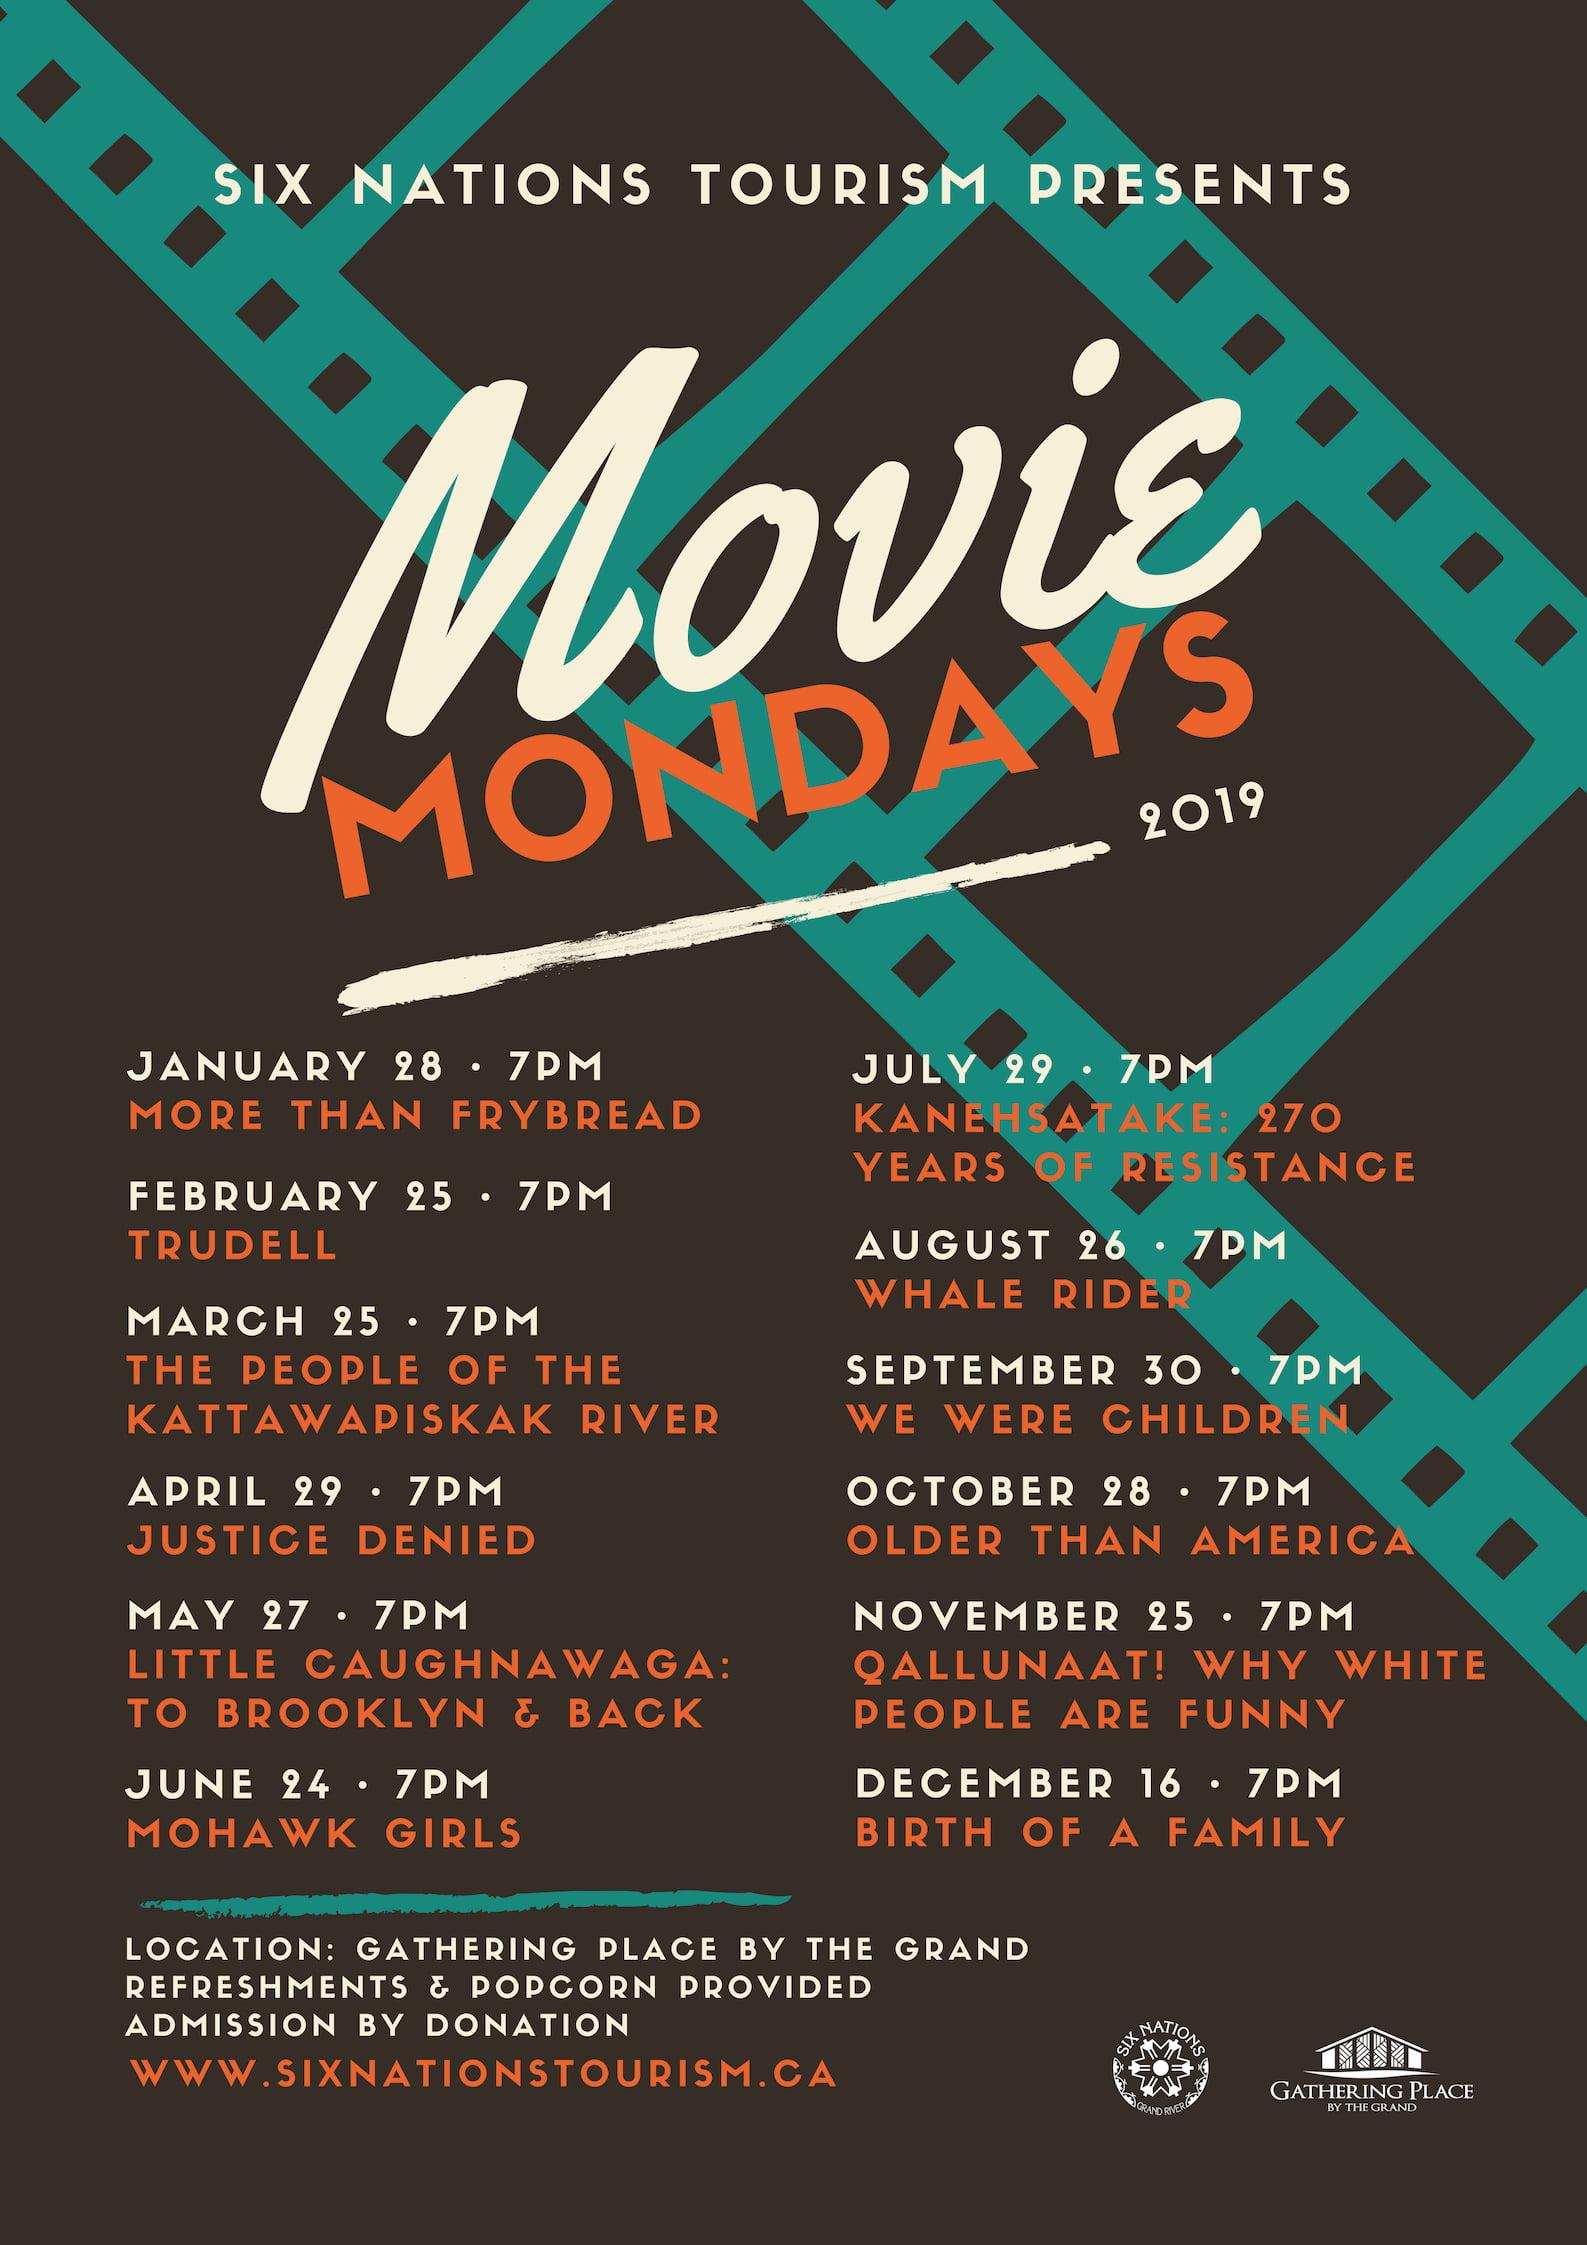 Six Nations Tourism Presents Movie Mondays 2019